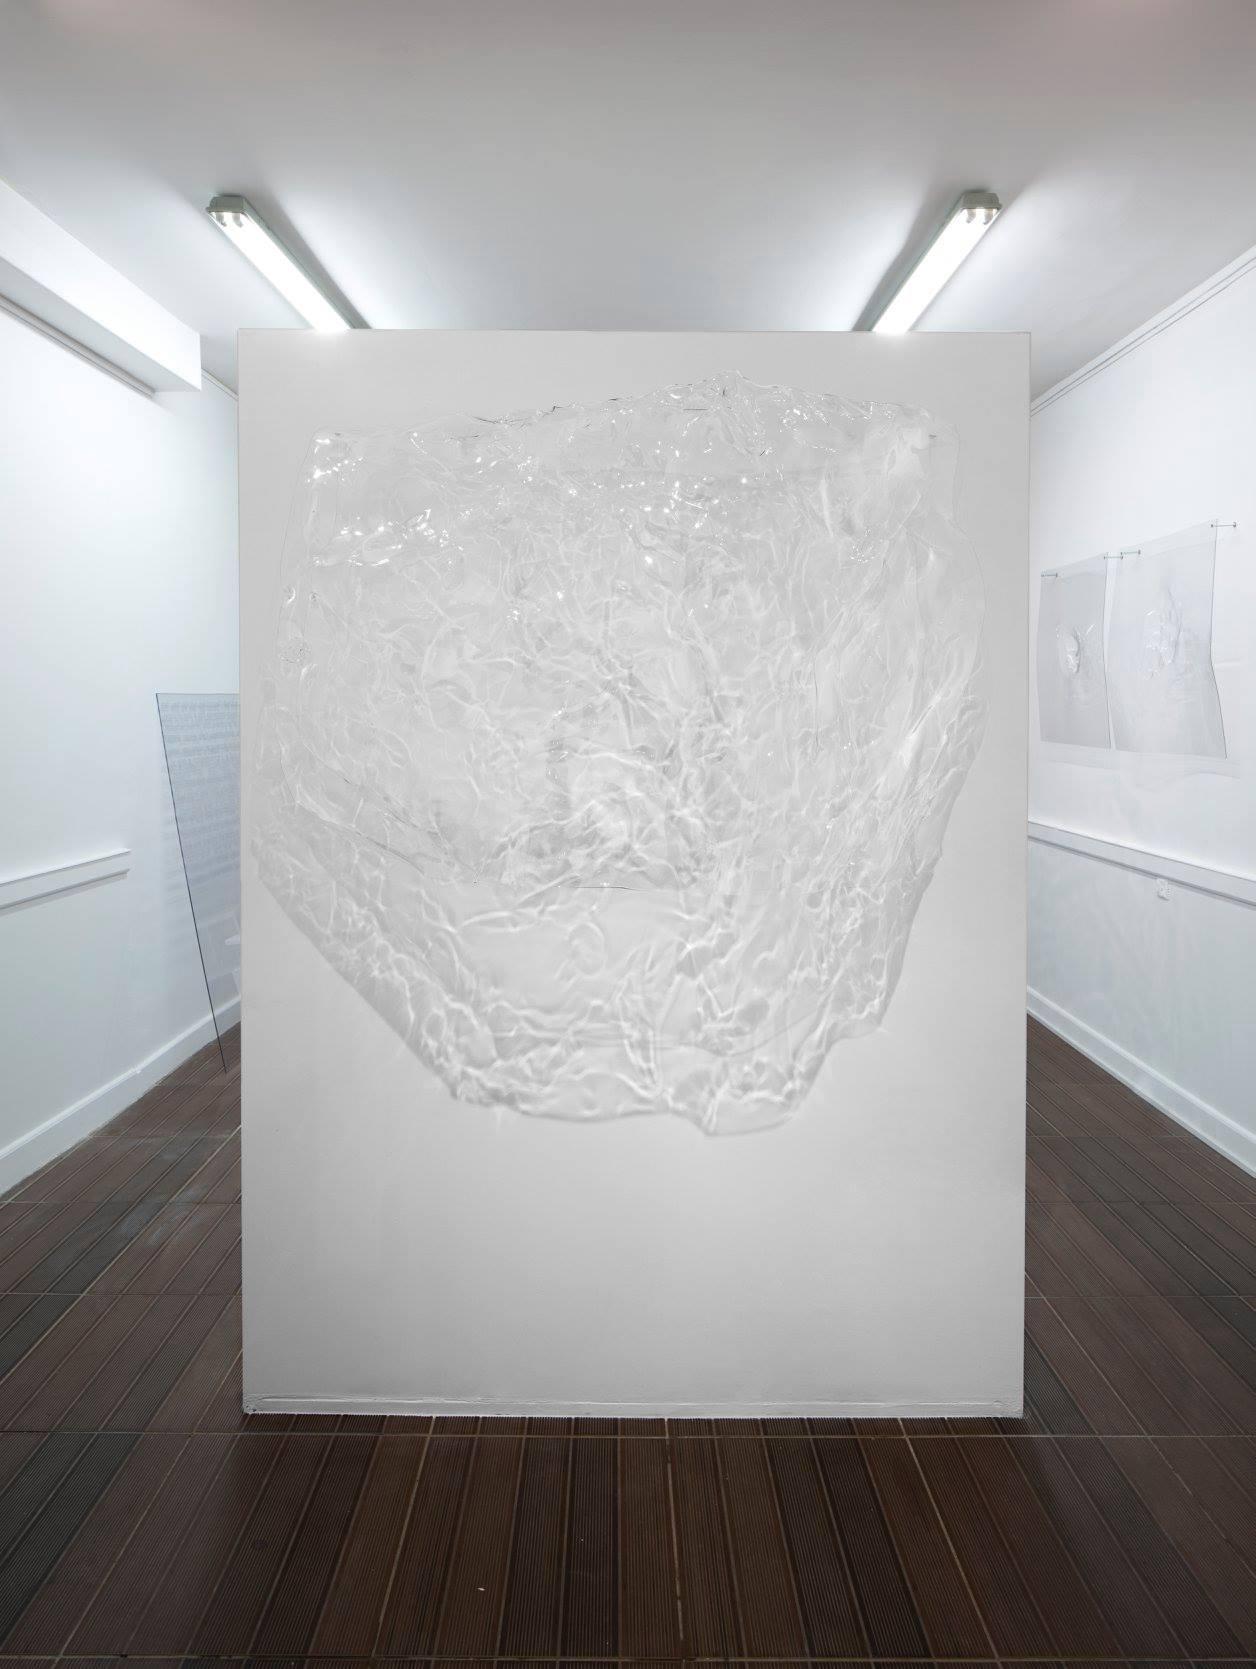 Resin4, 2016. 90 x 125 x 35 cm. Courtesy Ben Elliot & ARTAGŌN